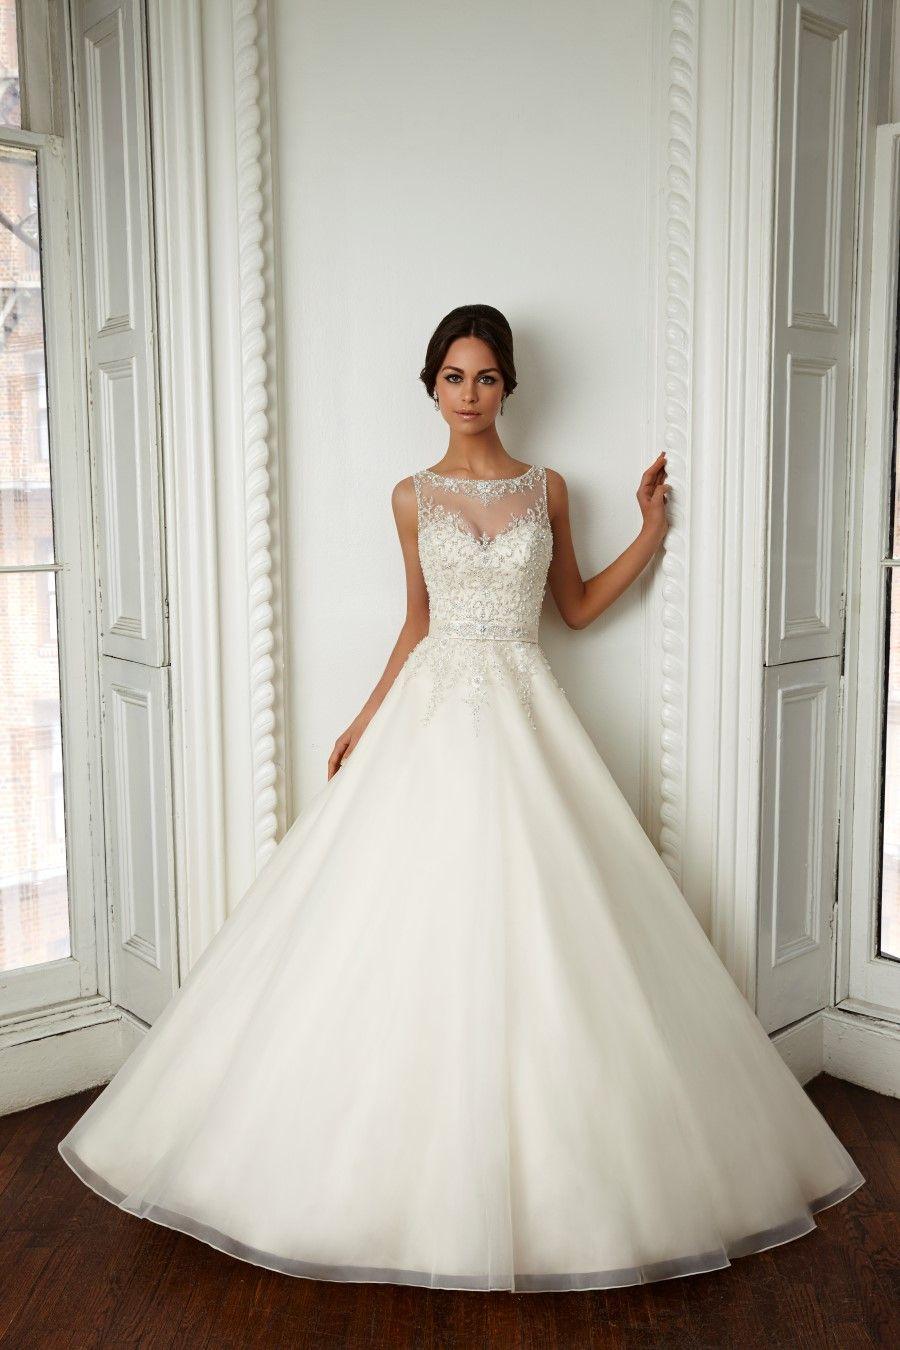 Die aktuelle Brautmode Kollektion | Pinterest | Brautmode, Die ...